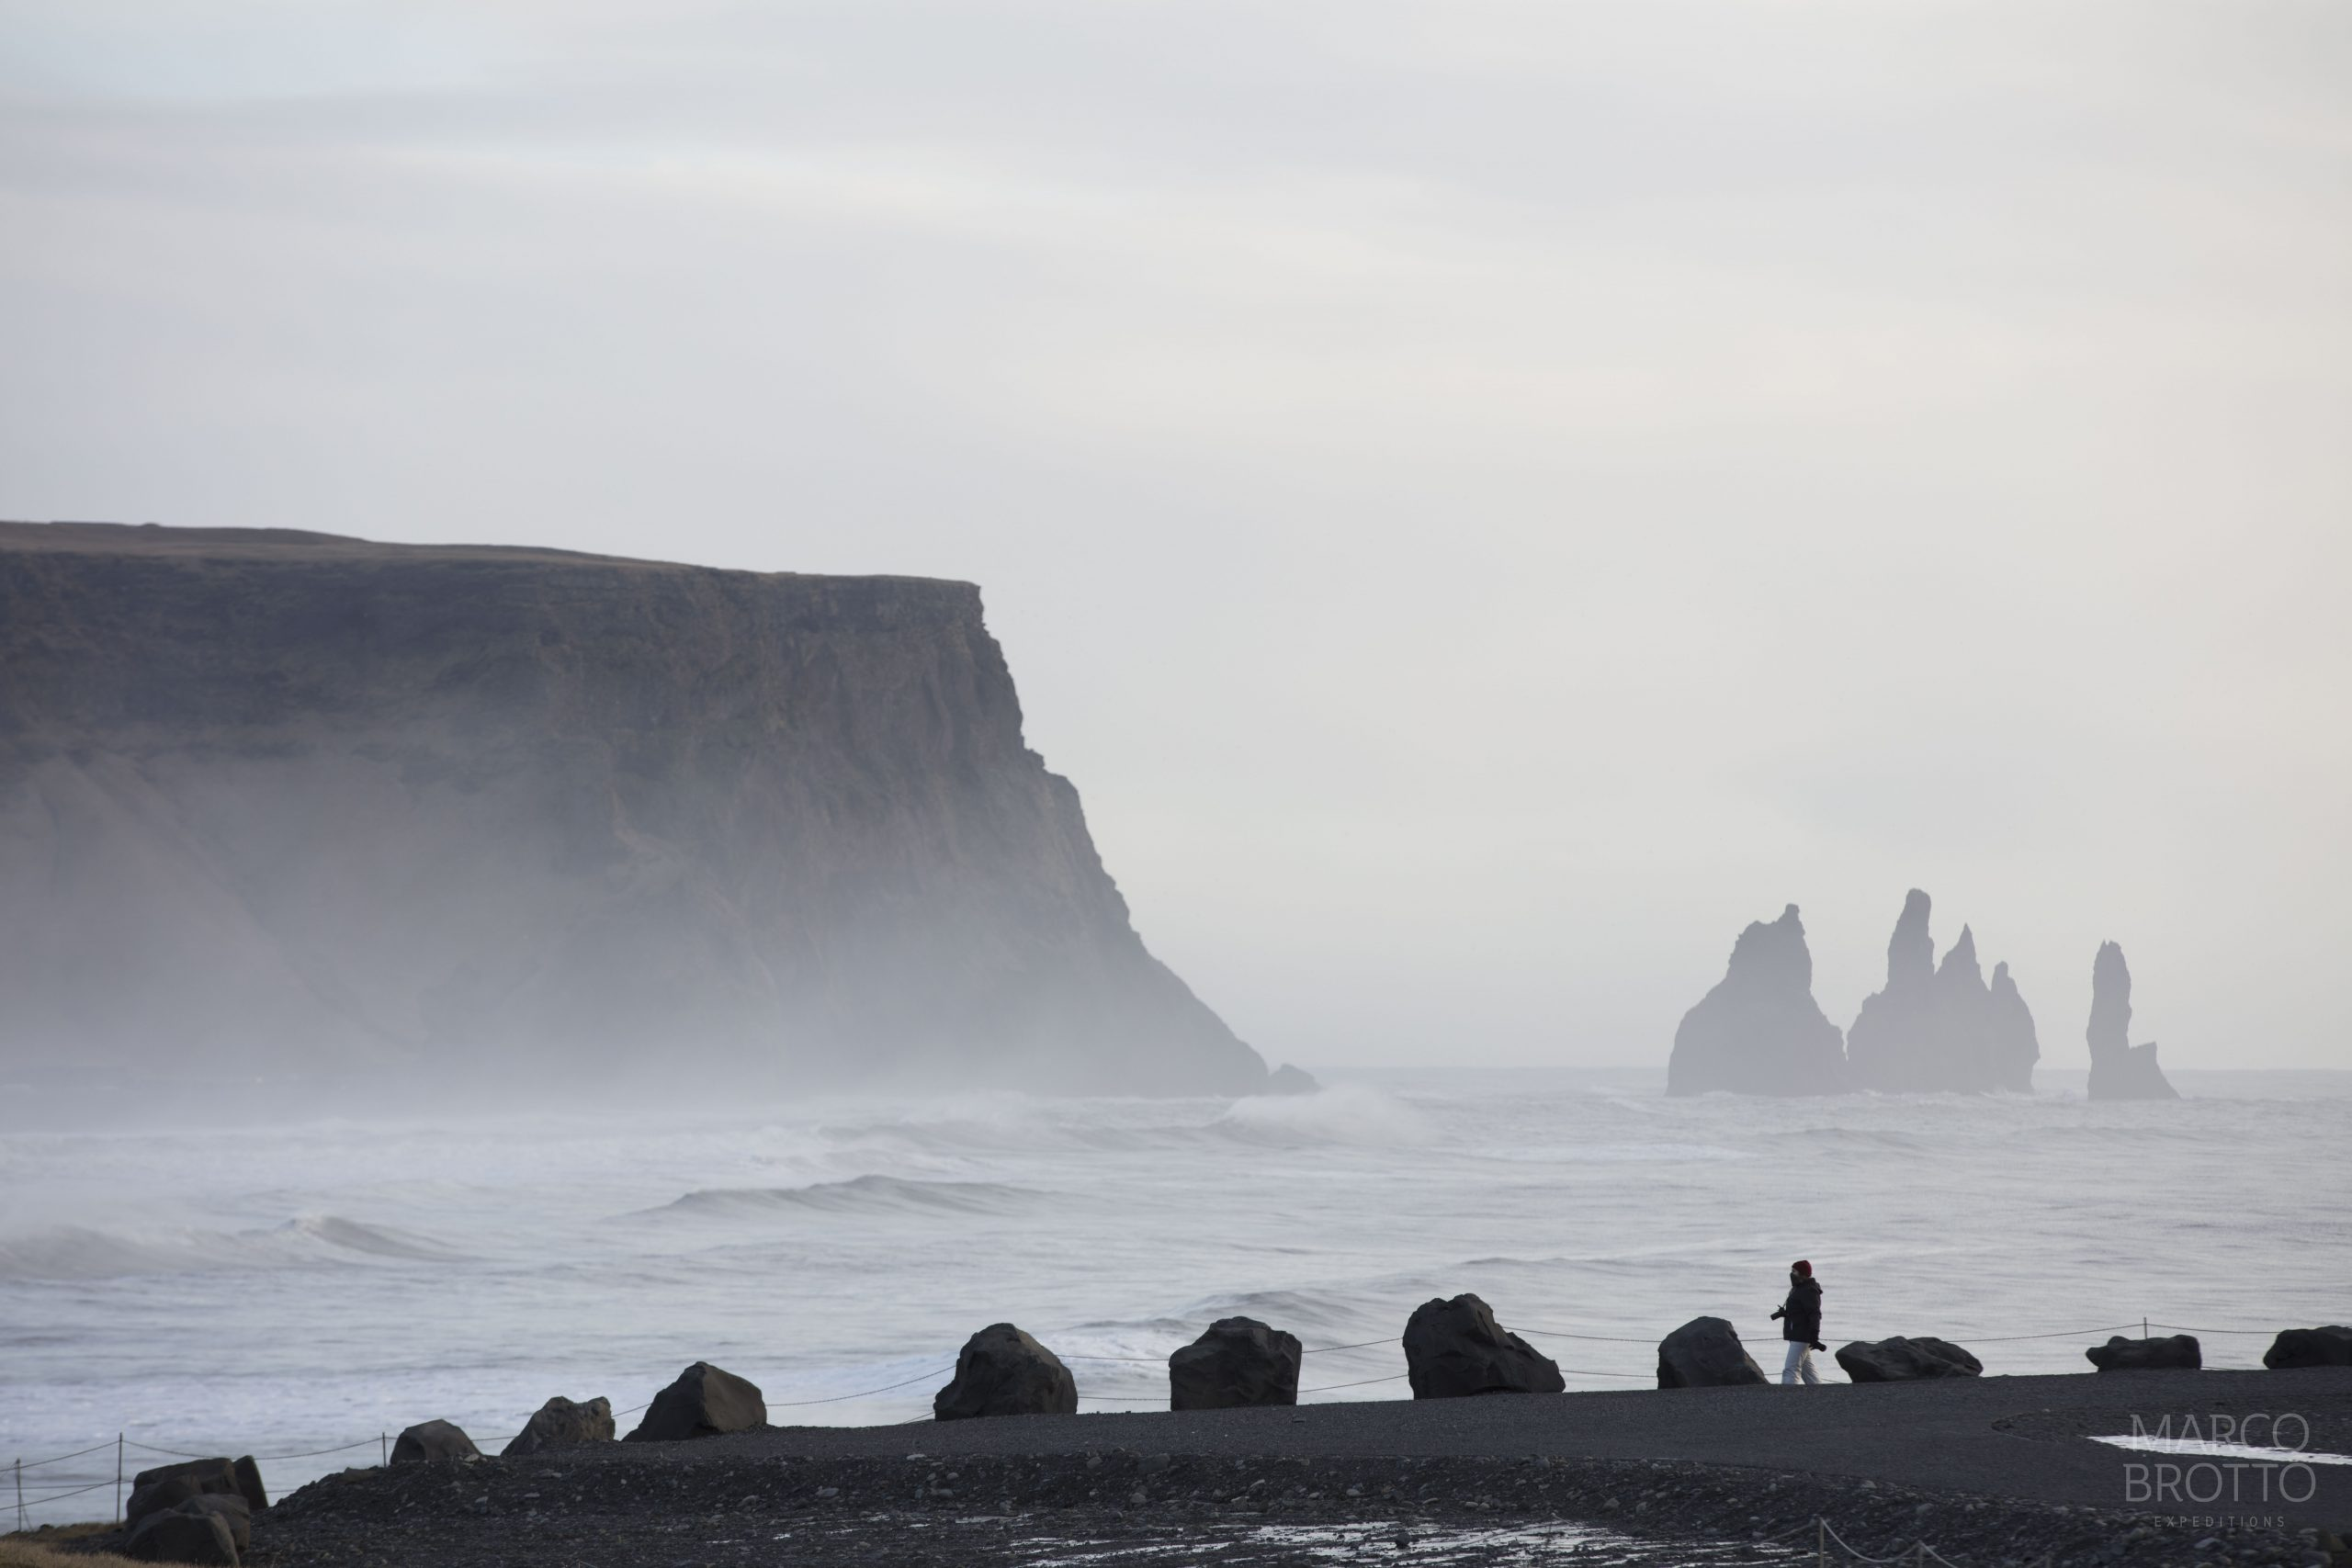 ICELAND-17-NOV-Jorge-Canon-EOS-5DS-2017-11-09-032222-16872